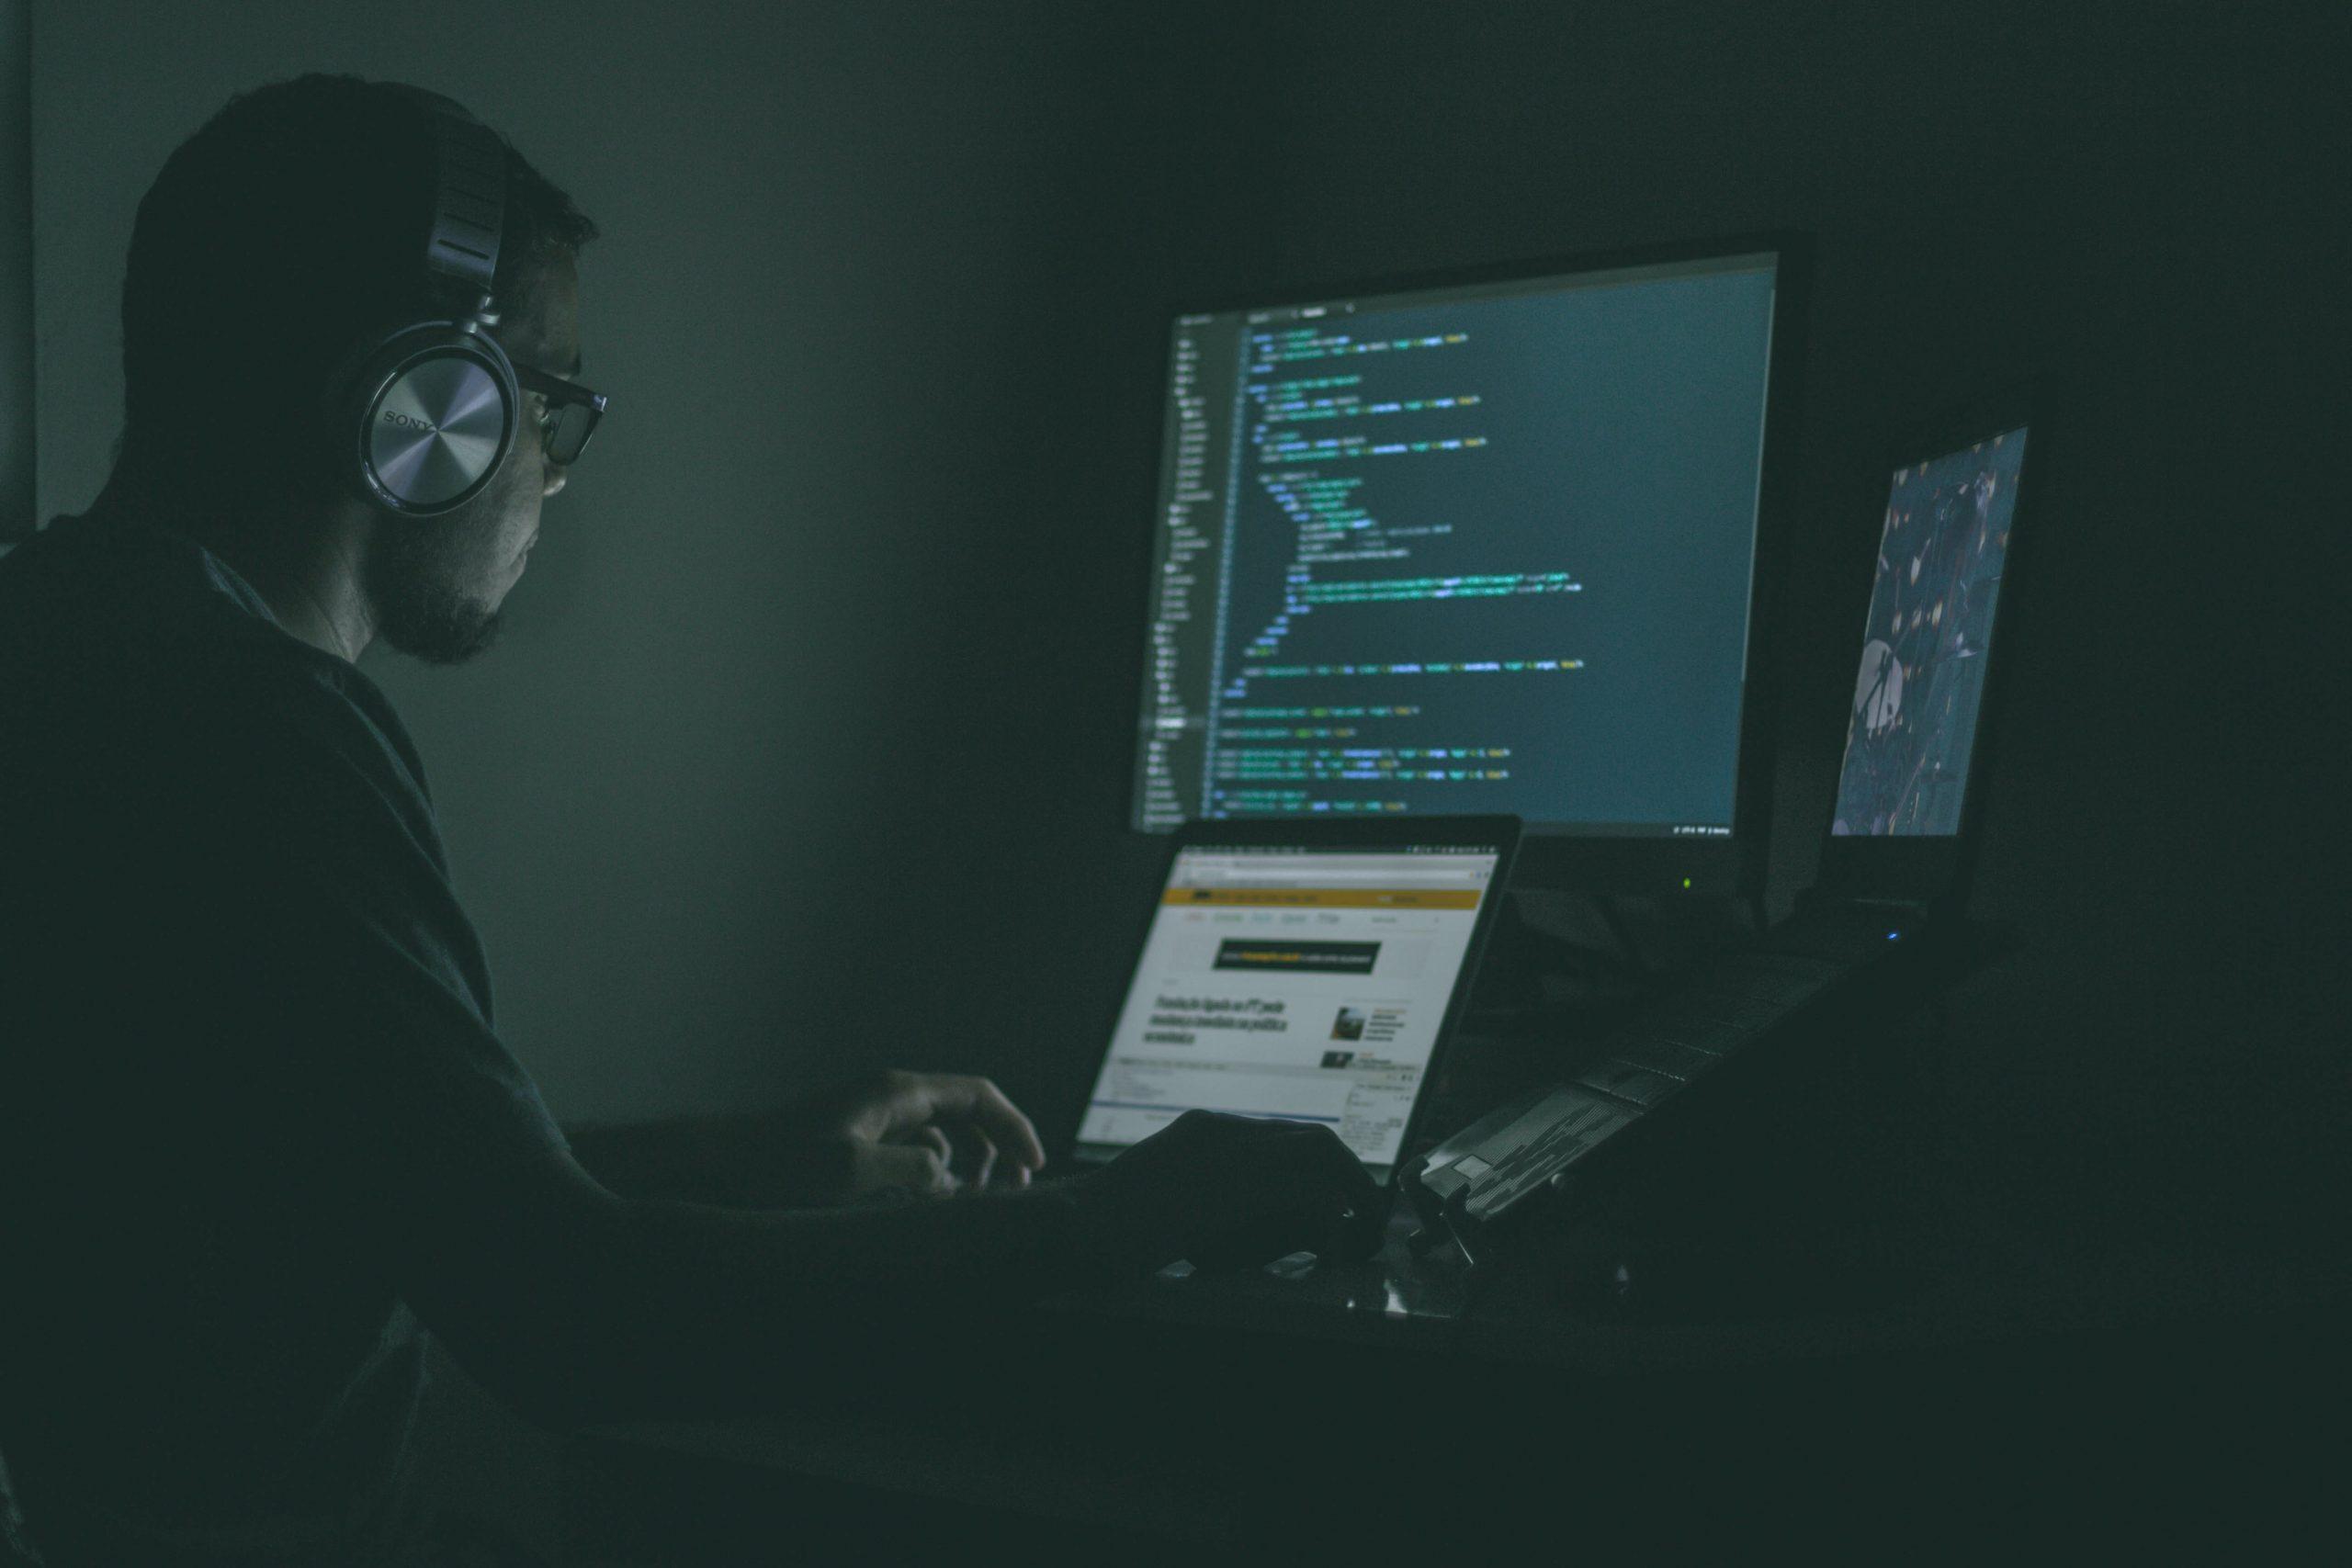 Jasa Pembuat Web – Web Developer Tangerang